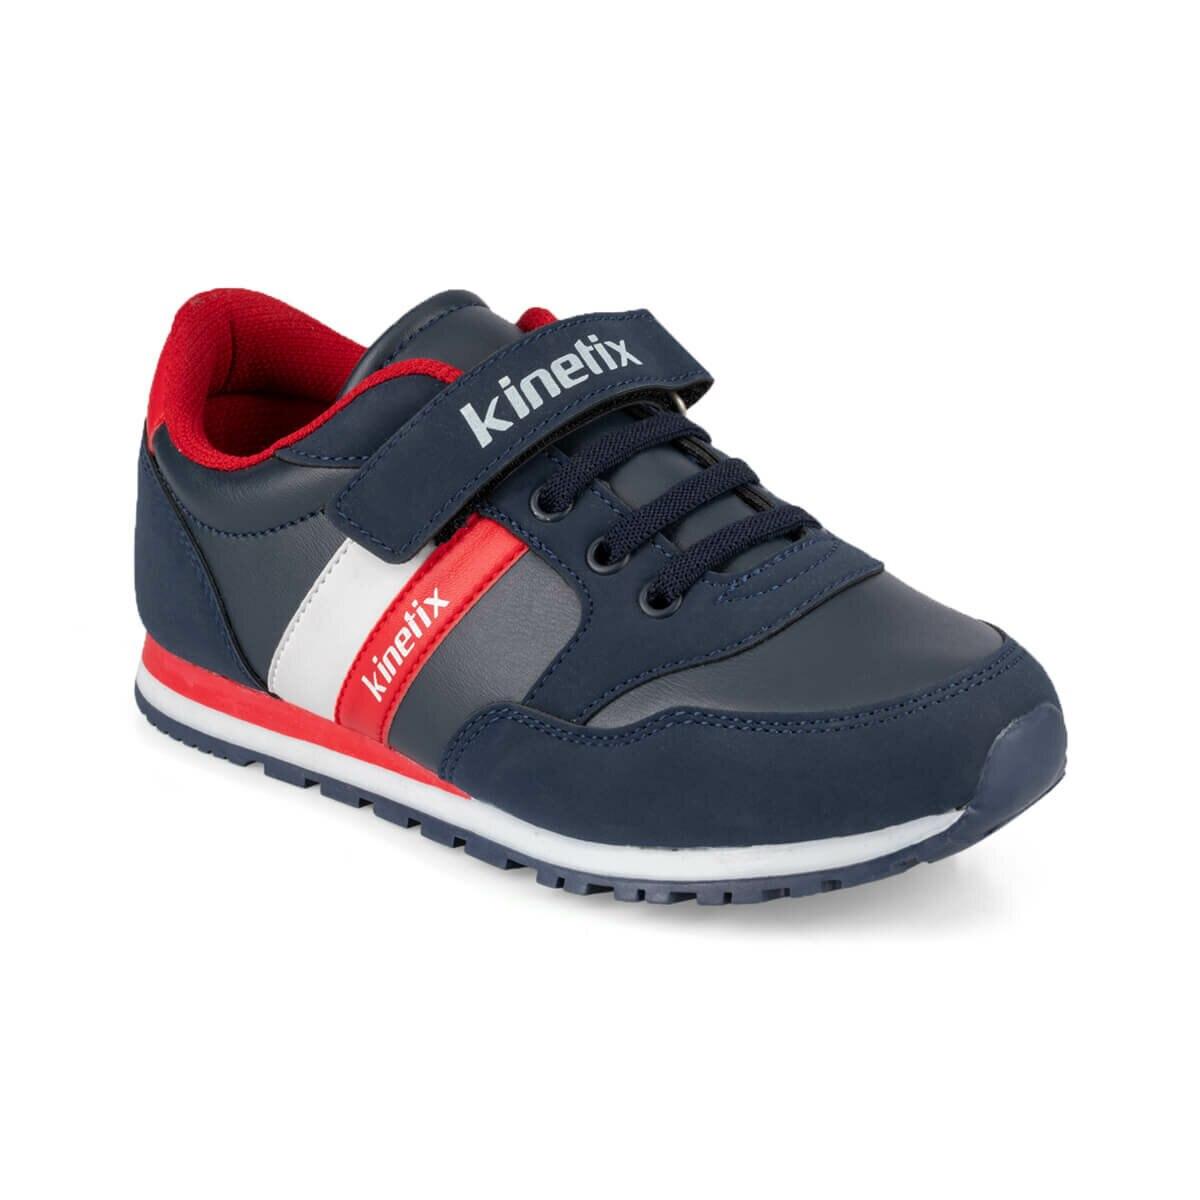 FLO PAYOF PU 9PR Navy Blue Male Child Sneaker Shoes KINETIX